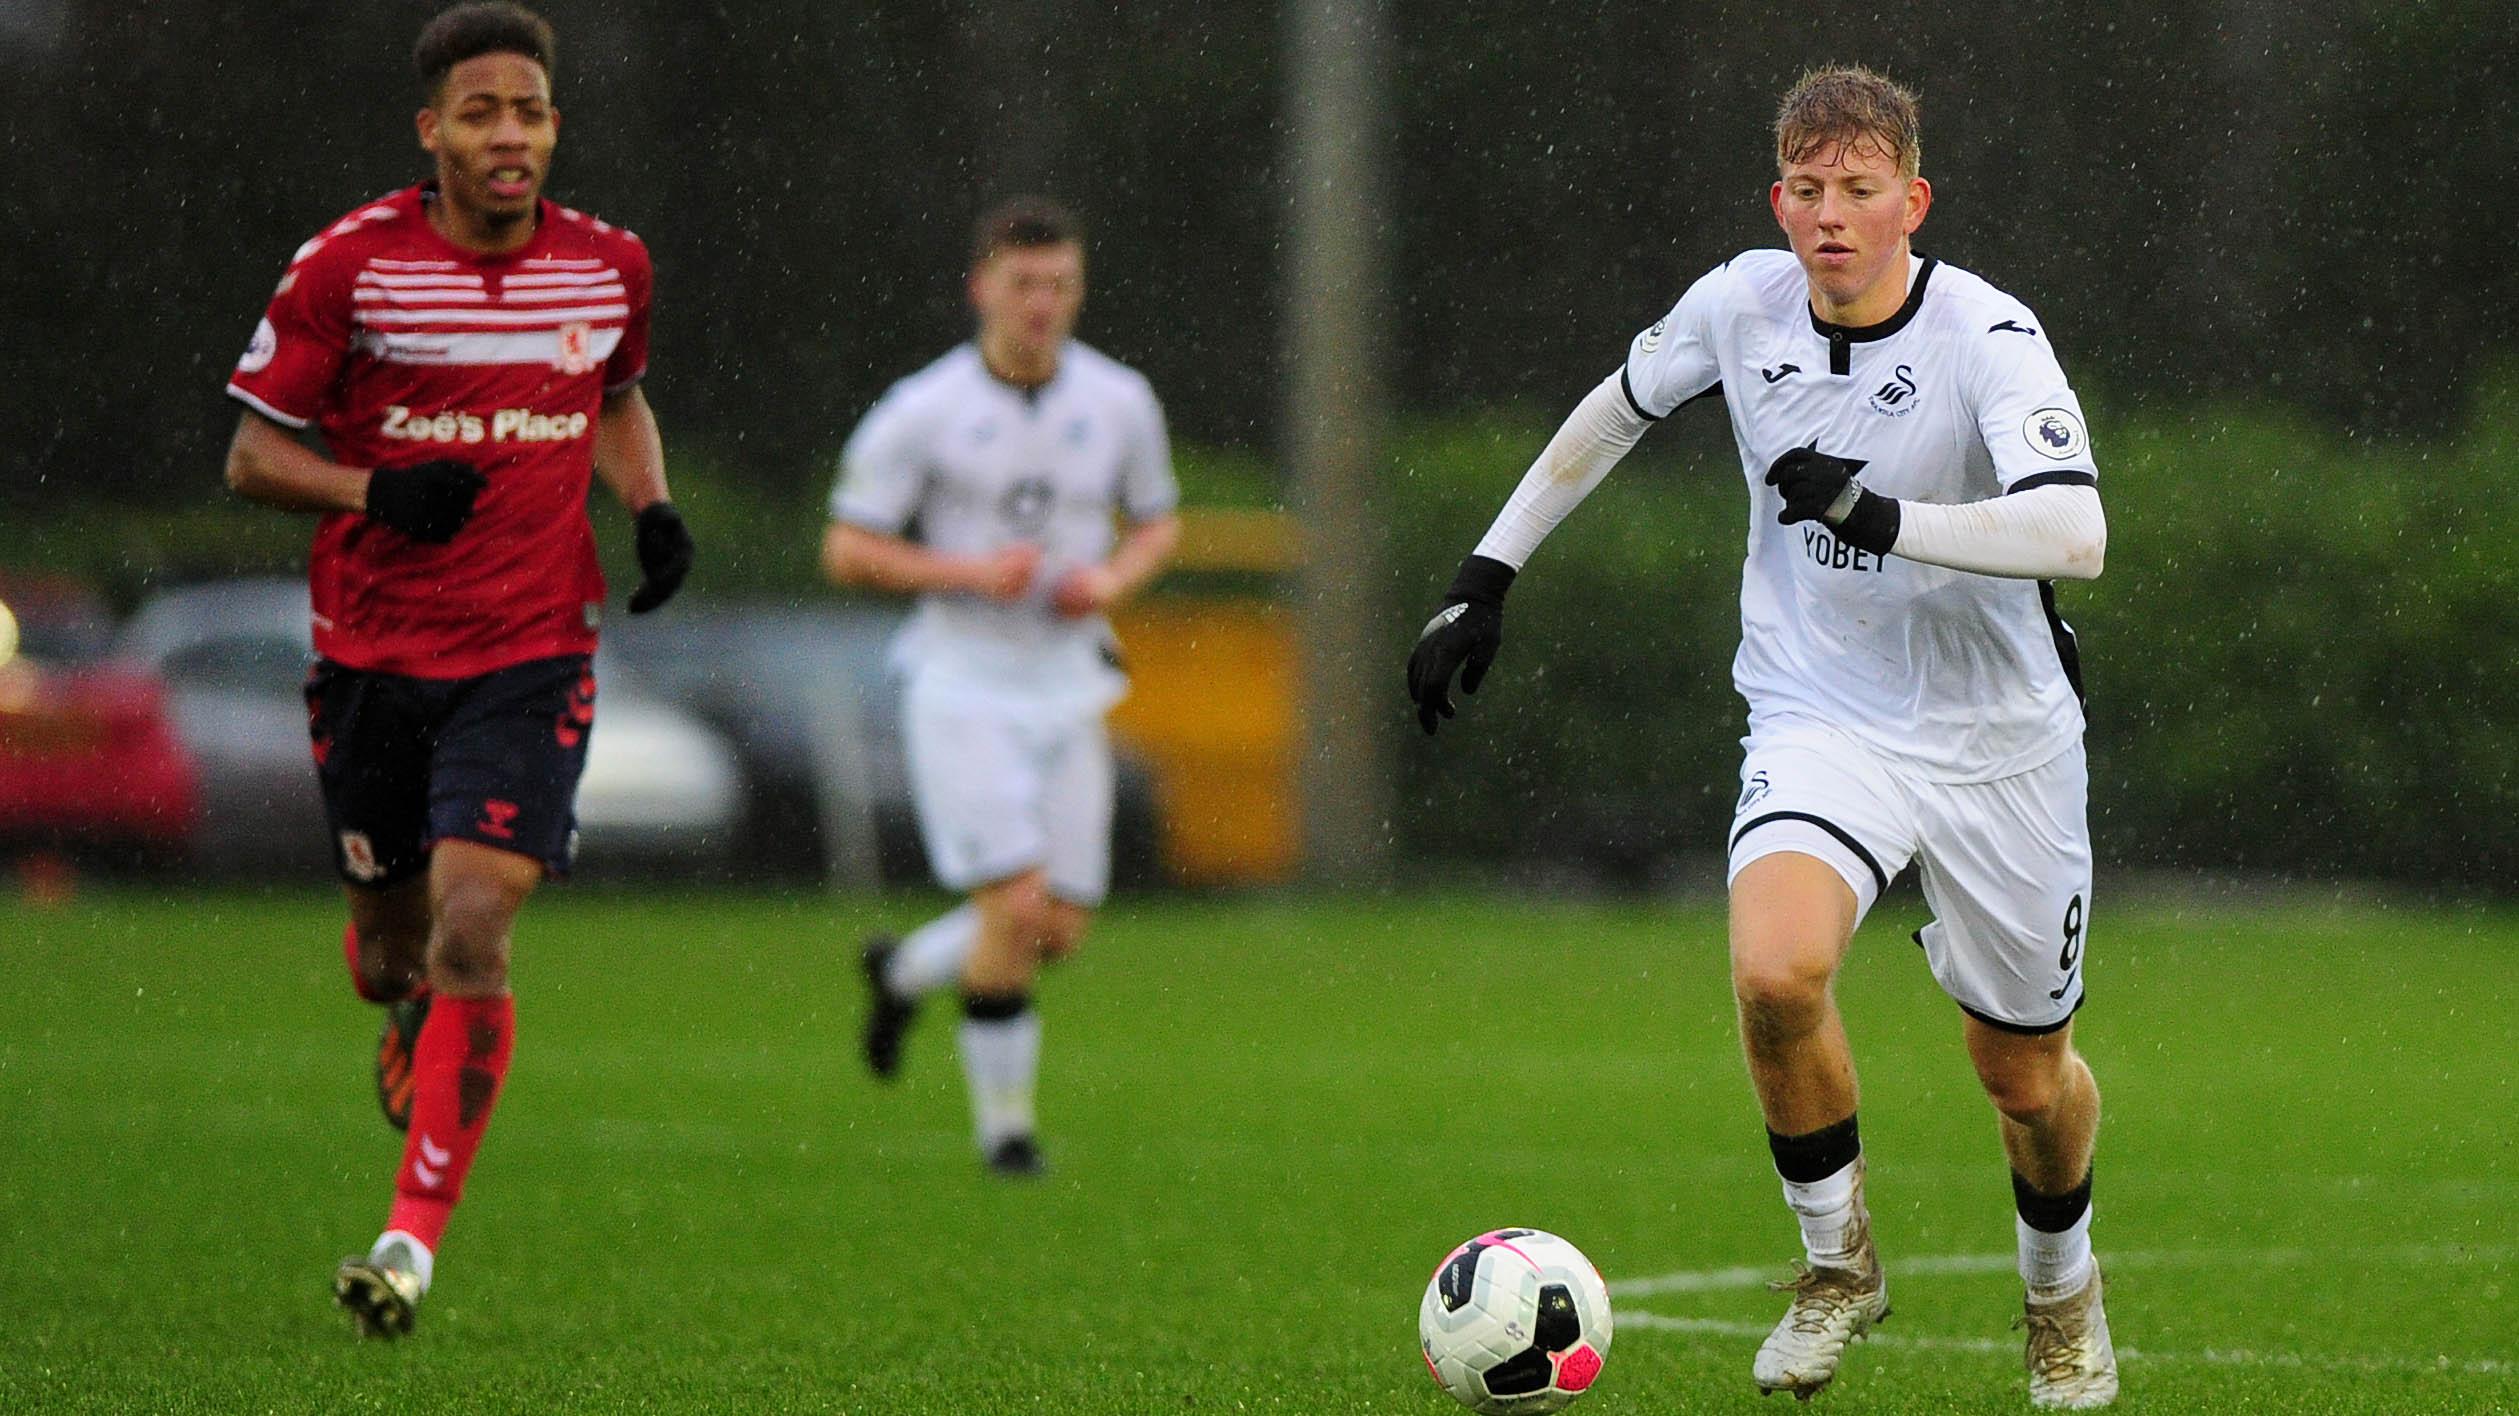 Swansea City Under-23s